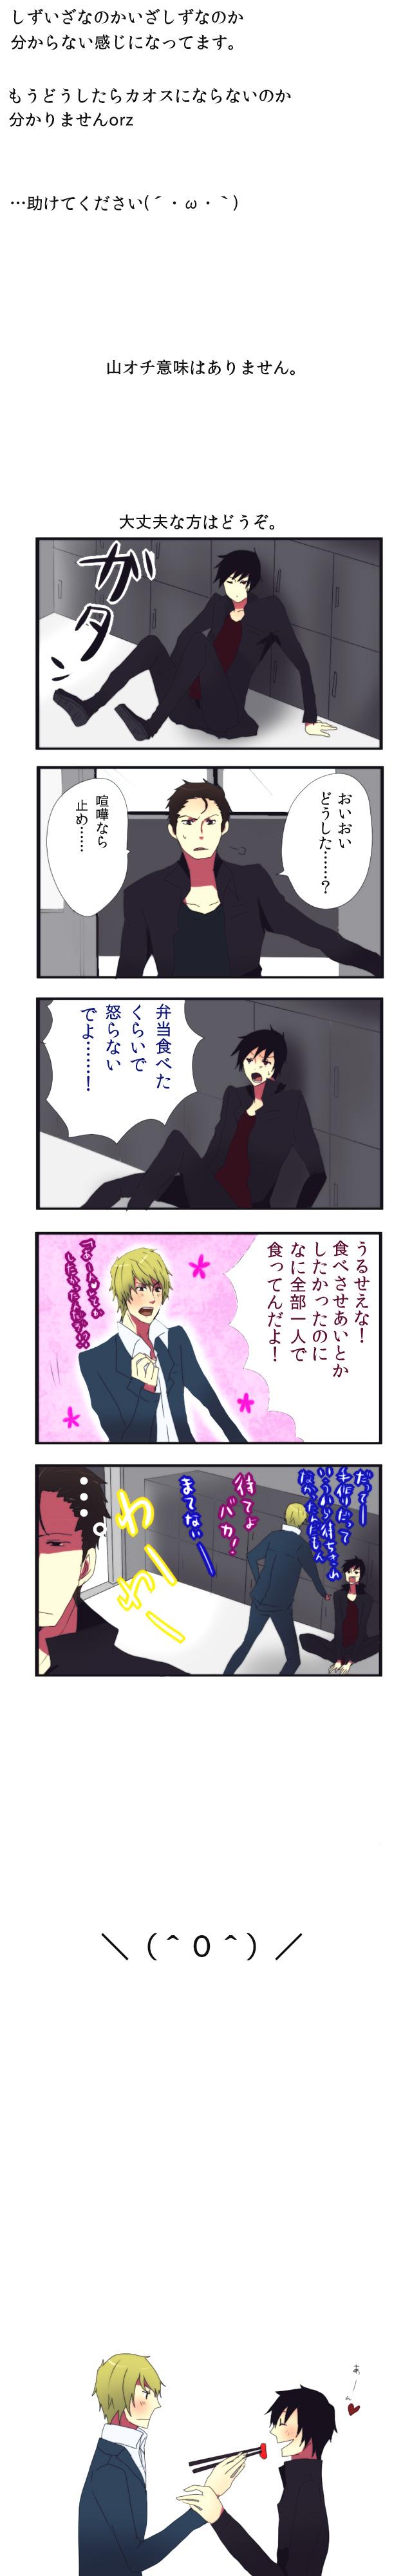 Tags: Anime, DURARARA!!, Heiwajima Shizuo, Orihara Izaya, Kadota Kyouhei, Translation Request, Comic